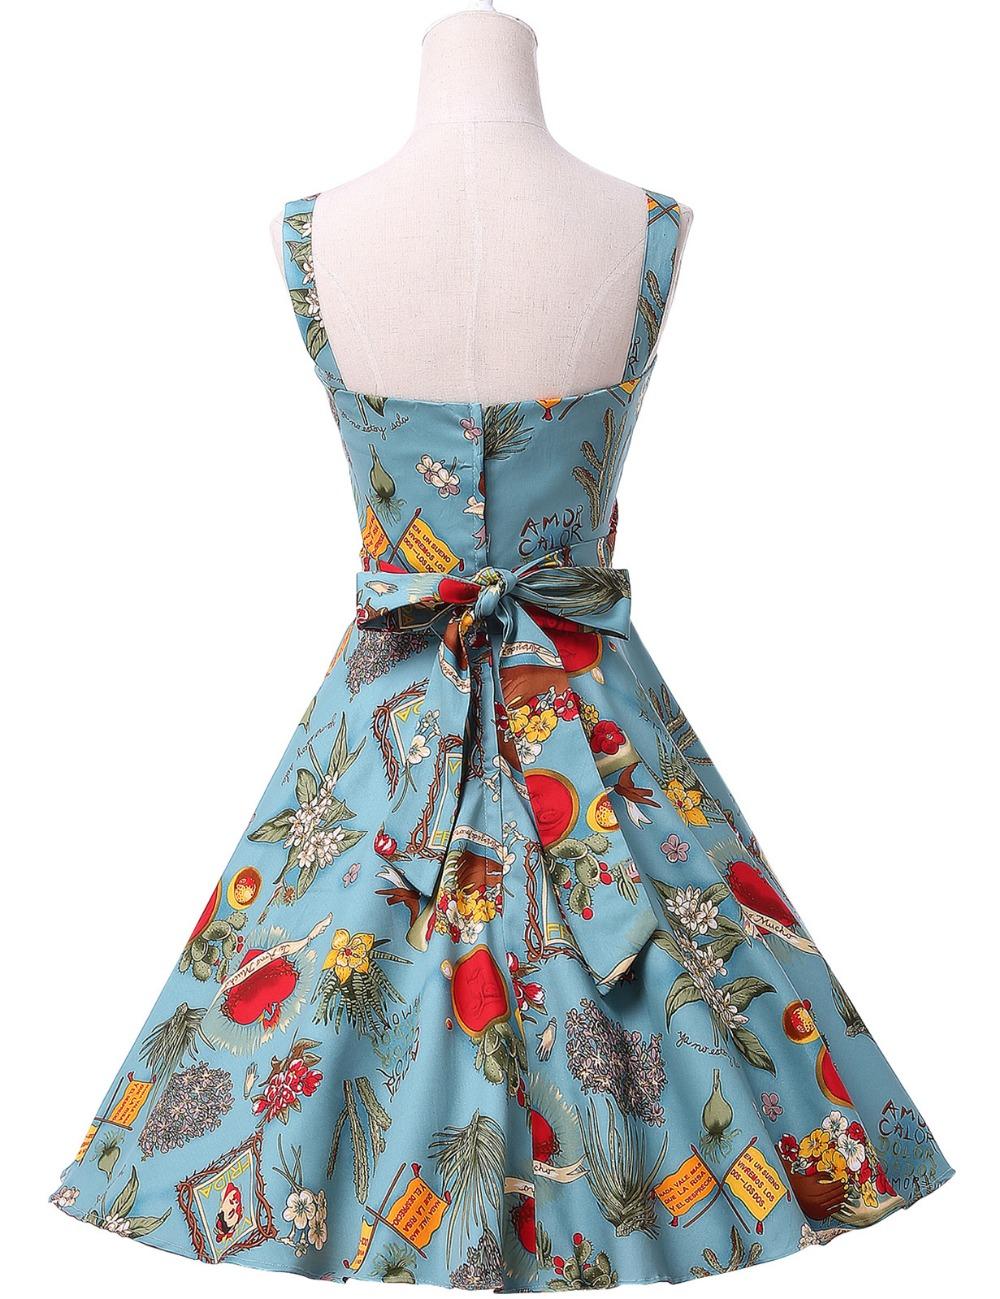 0ac172cf55b Women Summer Dress 2017 plus size clothing Audrey hepburn Floral robe Retro  Swing Casual 50s Vintage Rockabilly Dresses VestidosUSD 47.62 piece. Belle  Poque ...